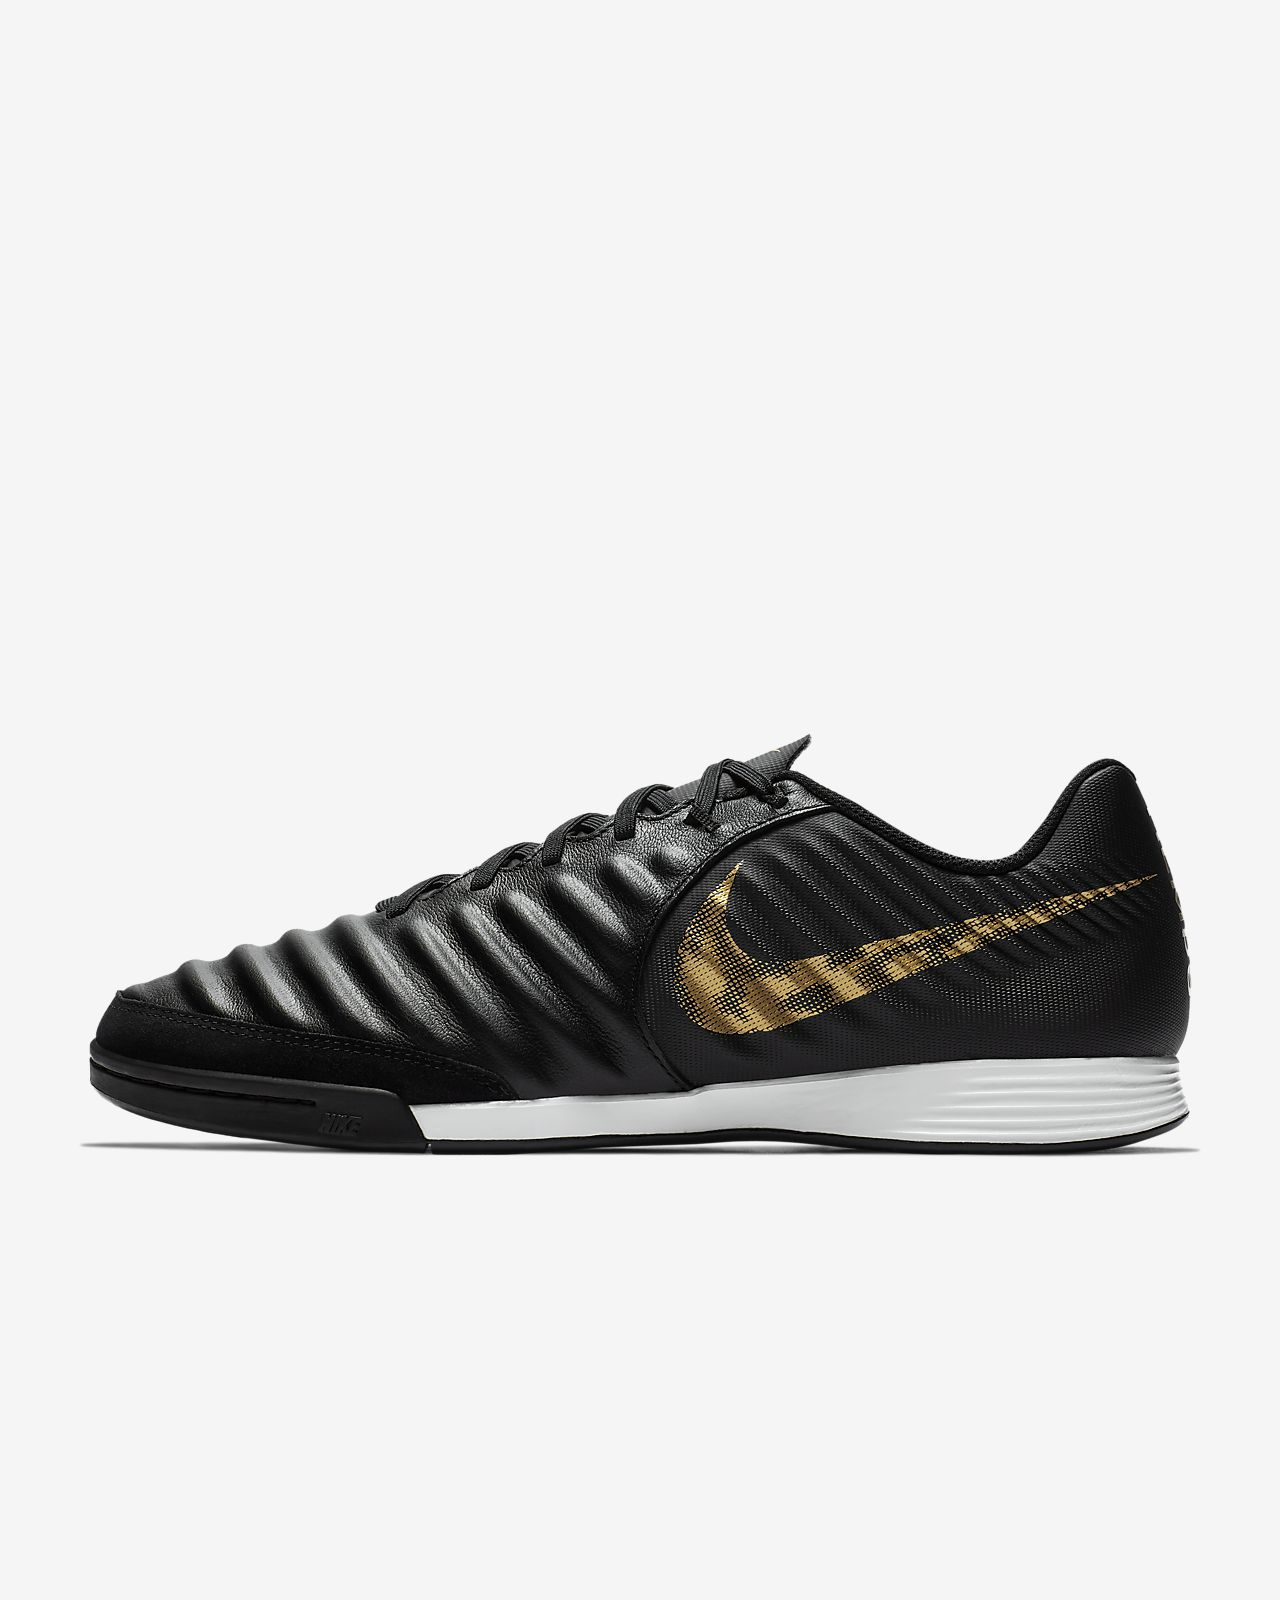 new product b7afe 127d9 ... Chaussure de football en salle à crampons Nike LegendX 7 Academy IC